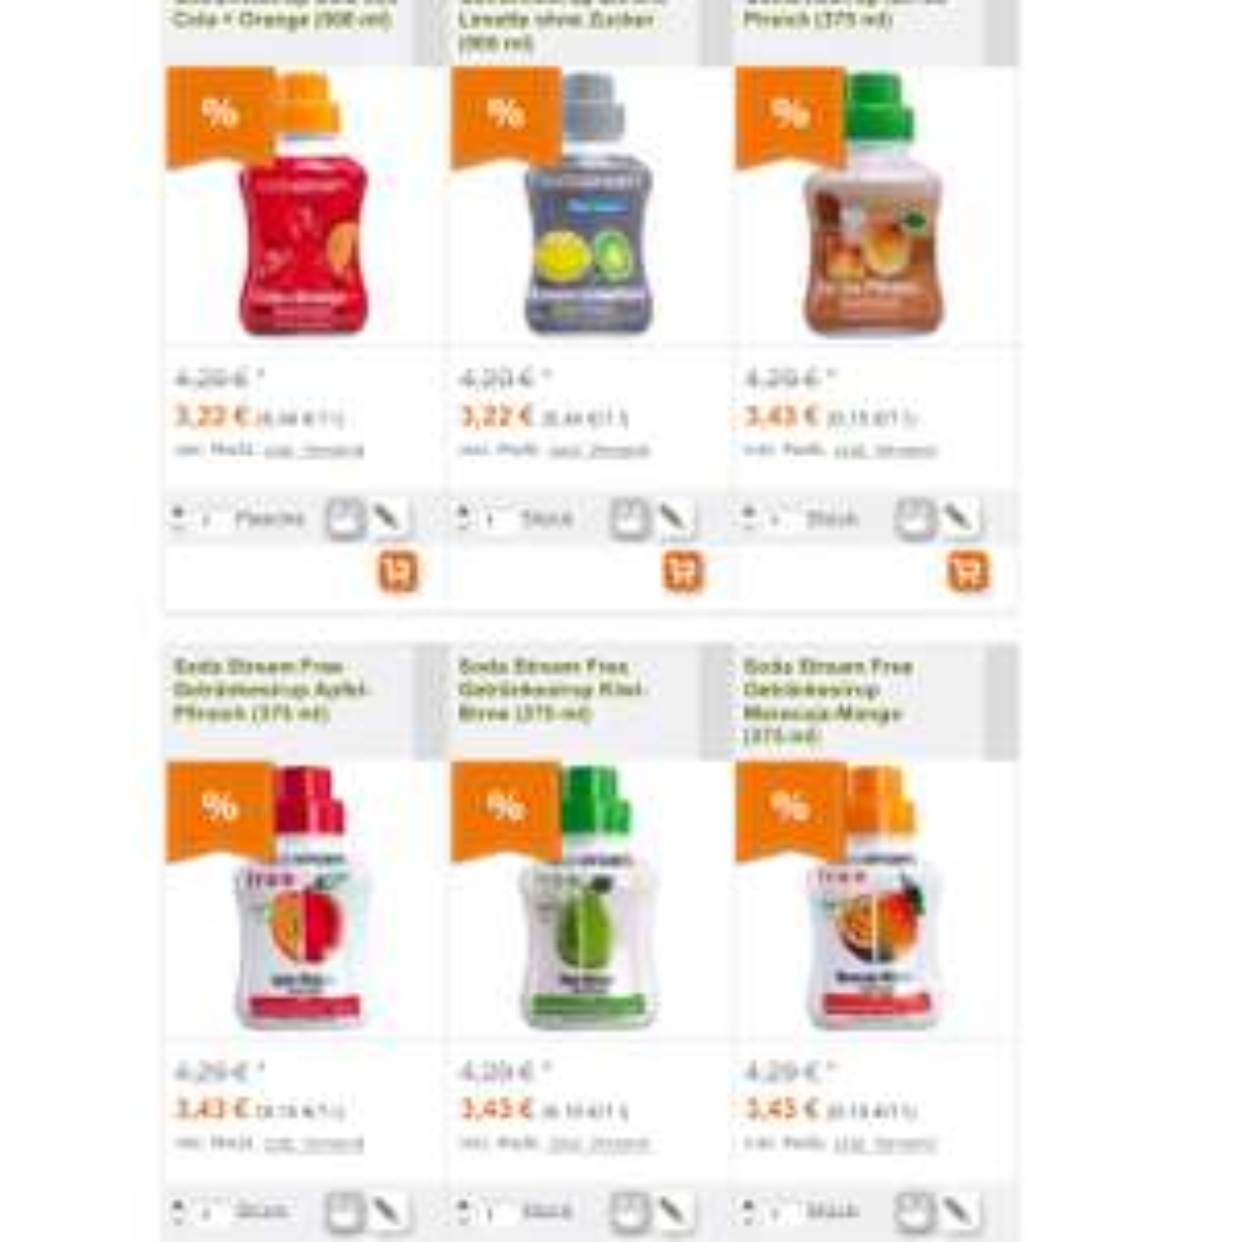 [mytime] Soda Stream verschiedene Sirupsorten ab 3,22€